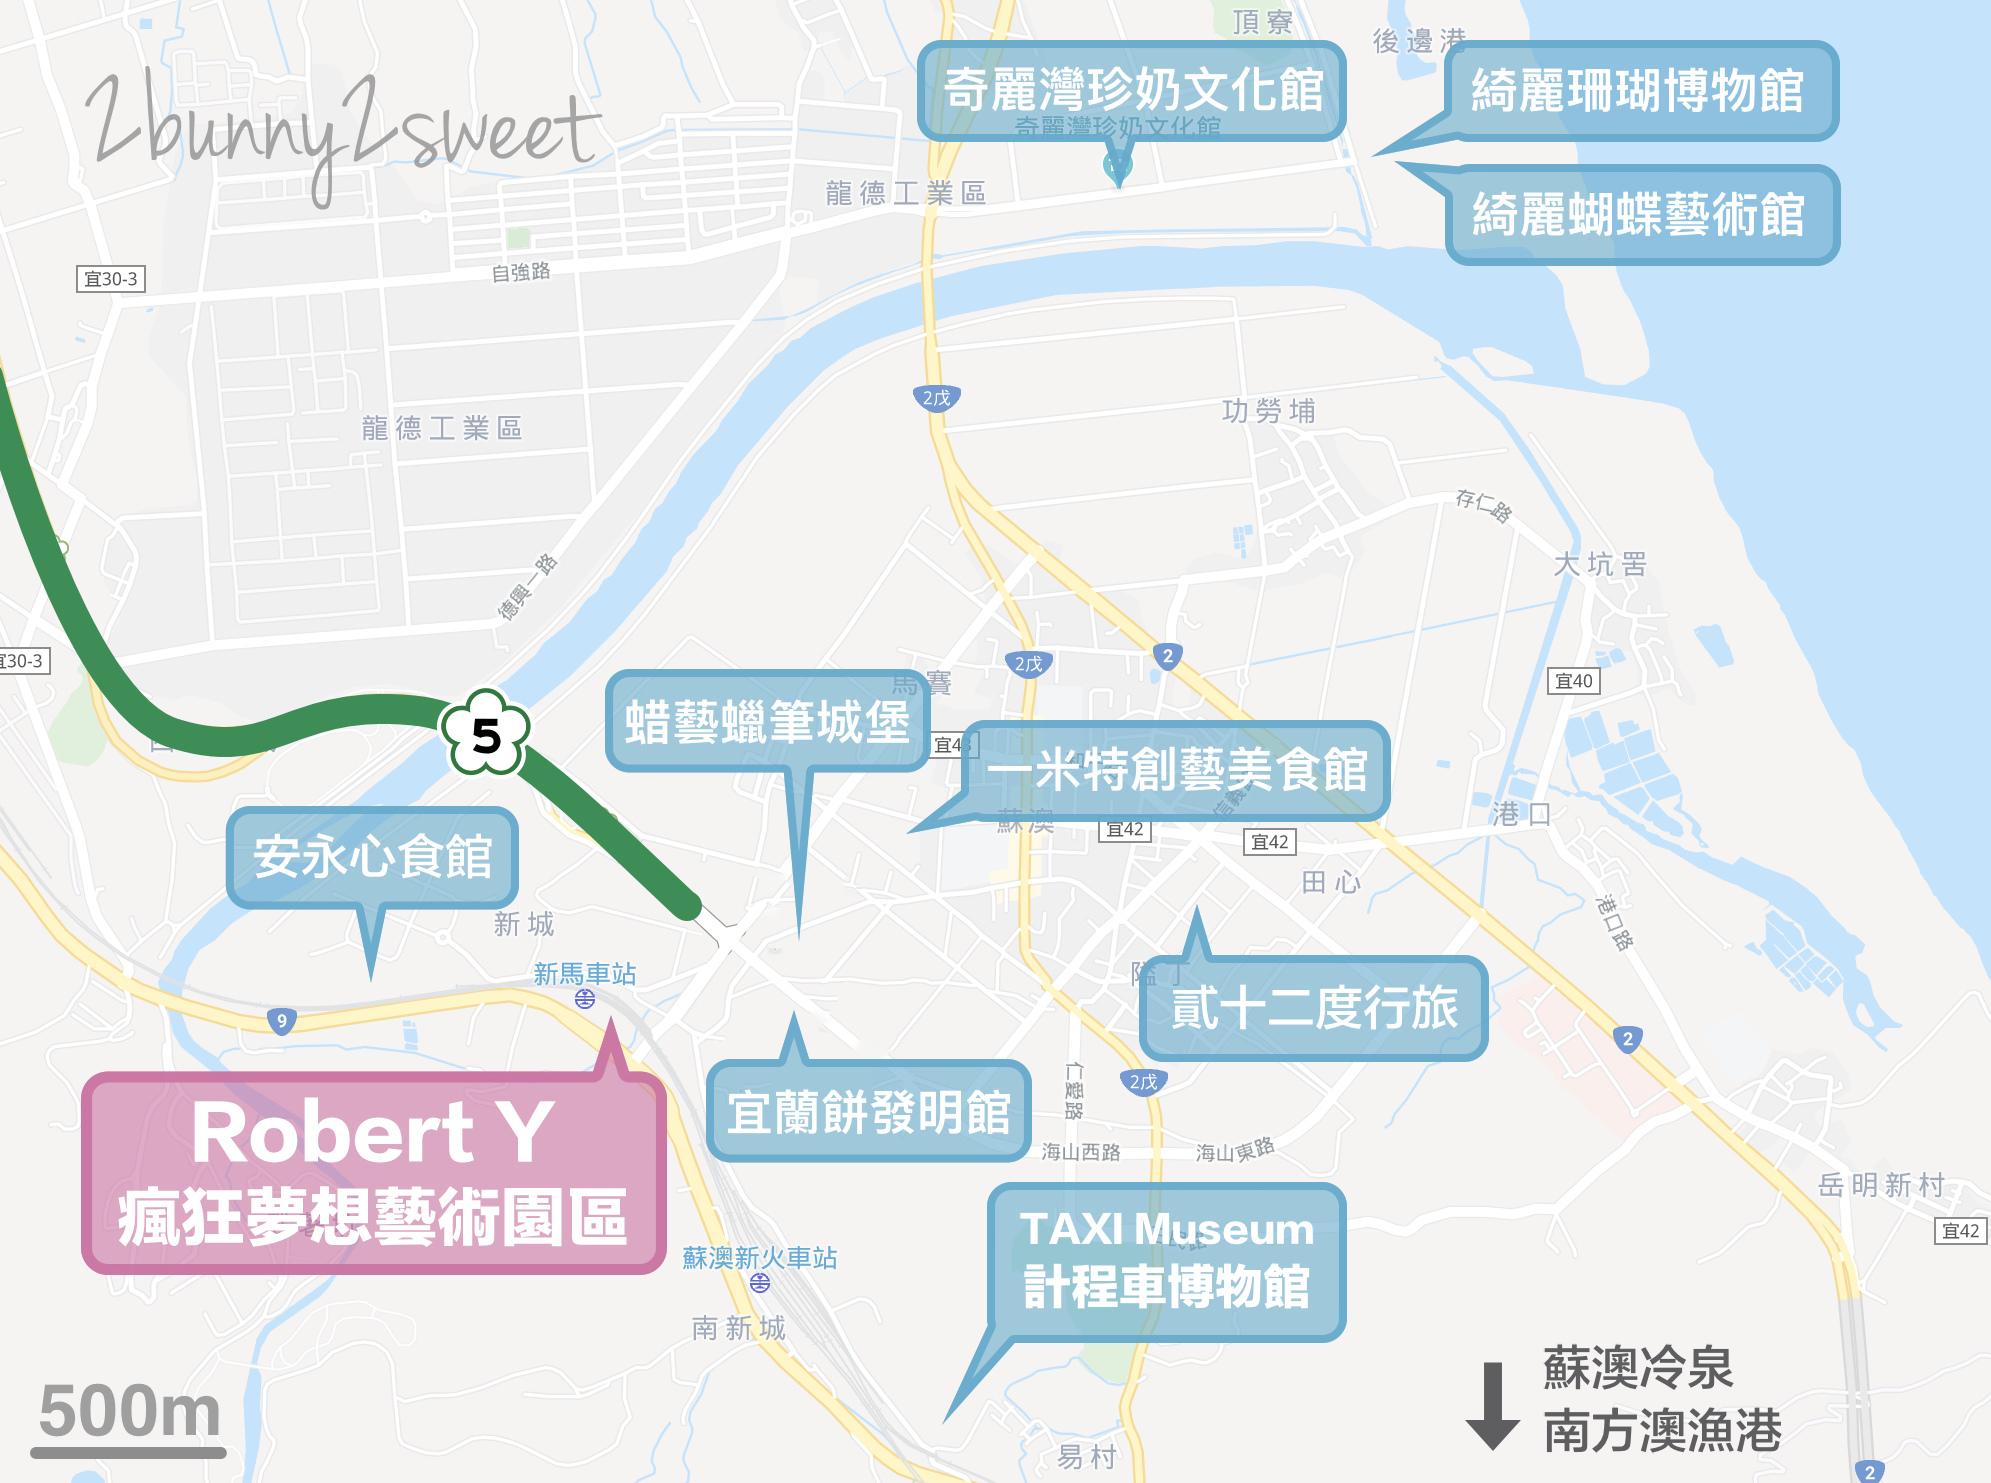 2019-1123-Robert Y 瘋狂夢想藝術園區-41